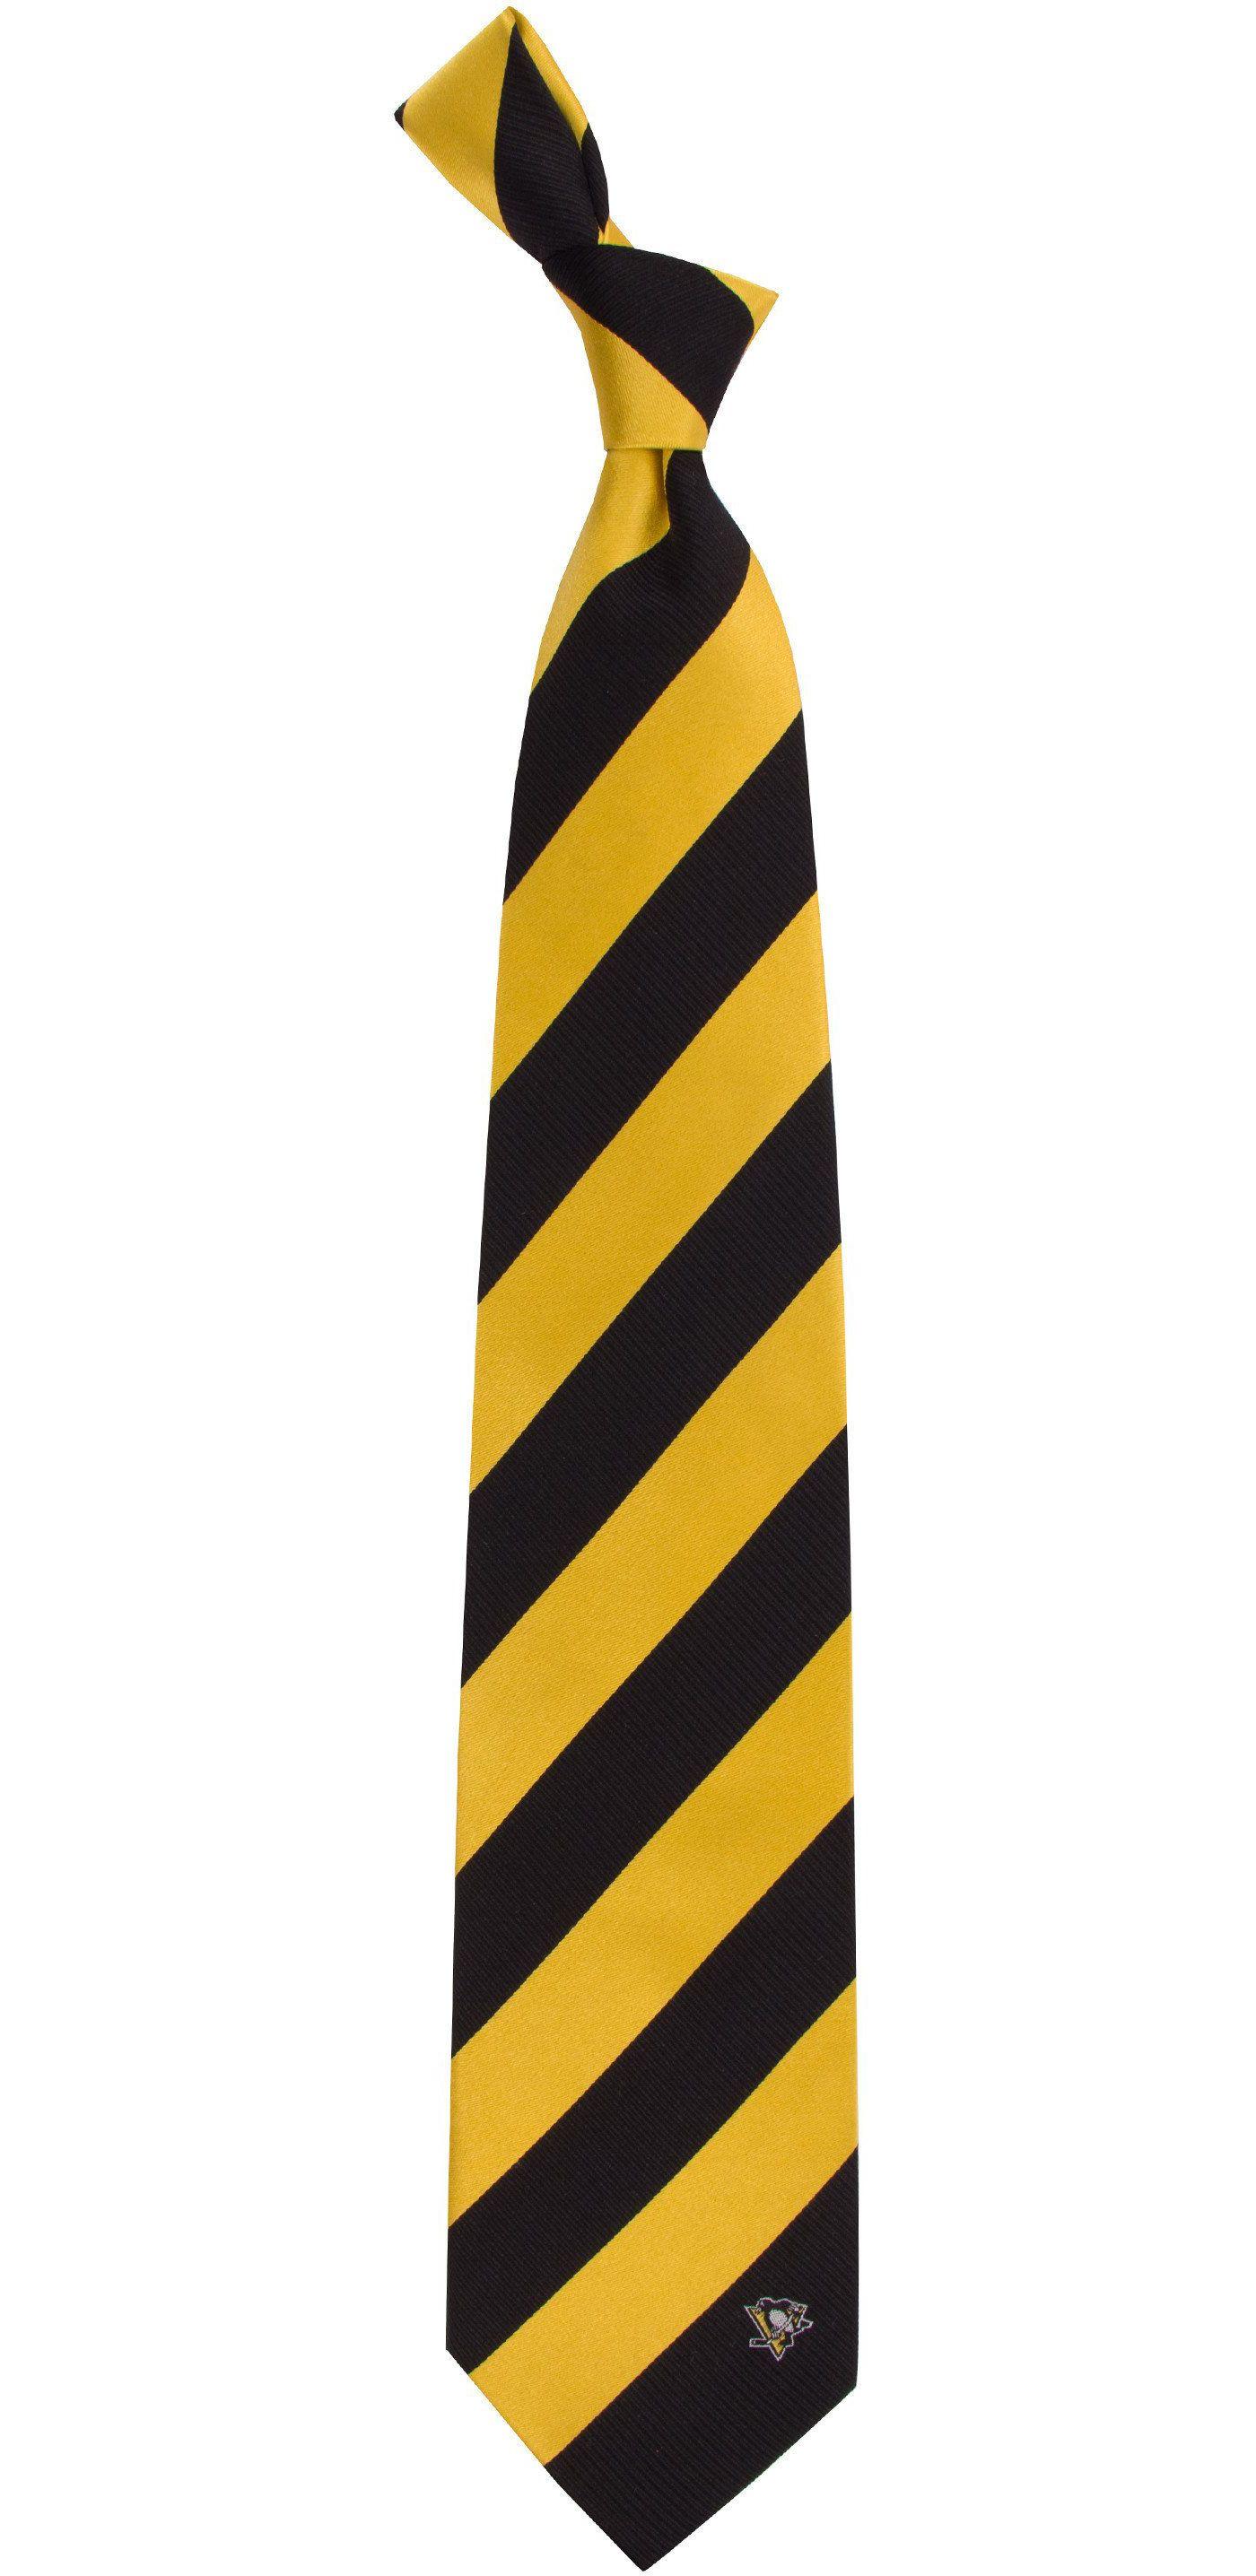 Eagles Wings Pittsburgh Penguins Woven Silk Necktie